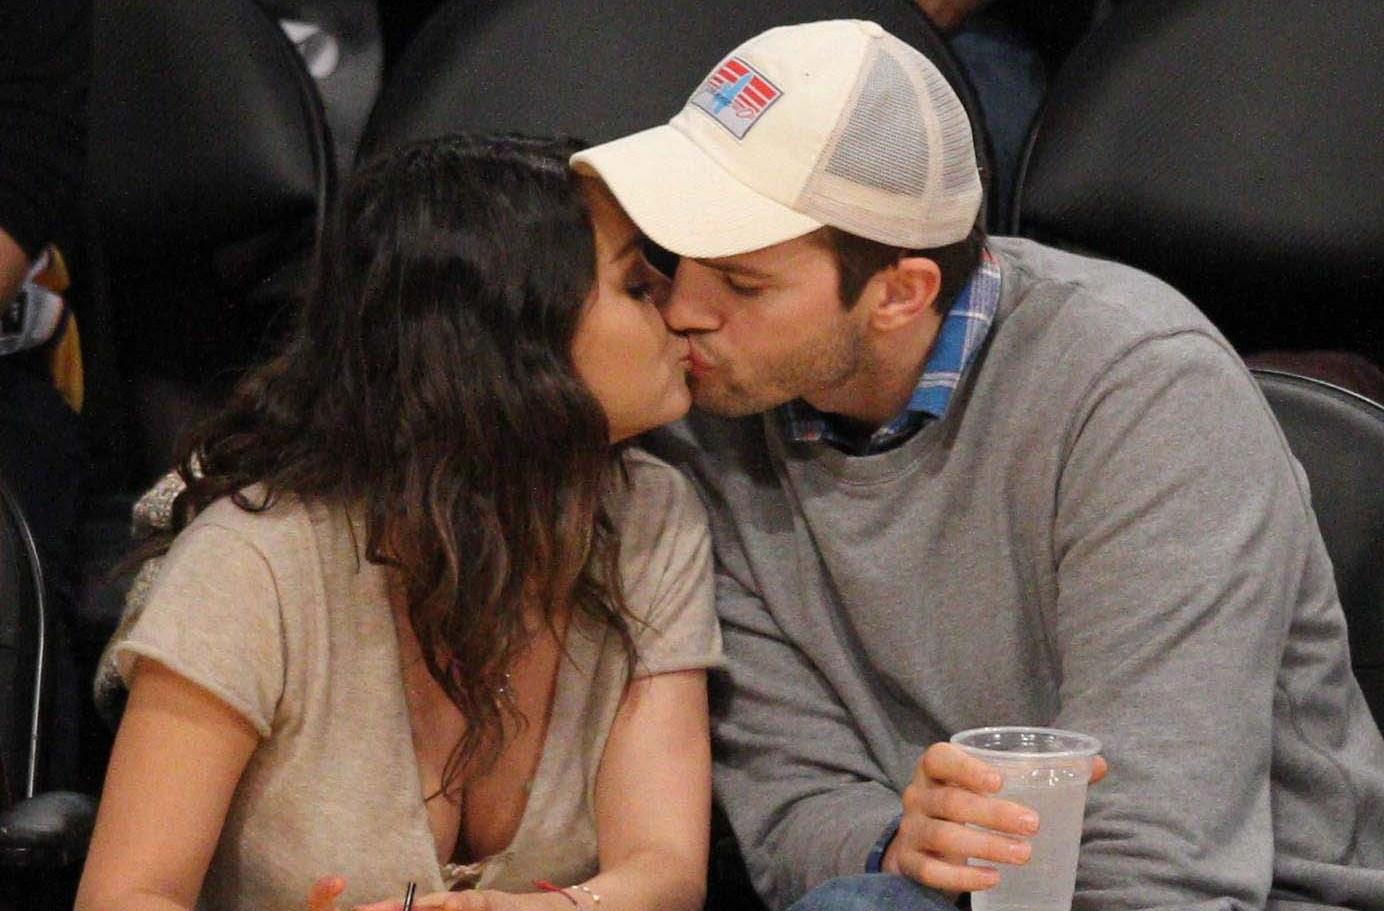 Mila Kunis and Ashton Kutcher costars